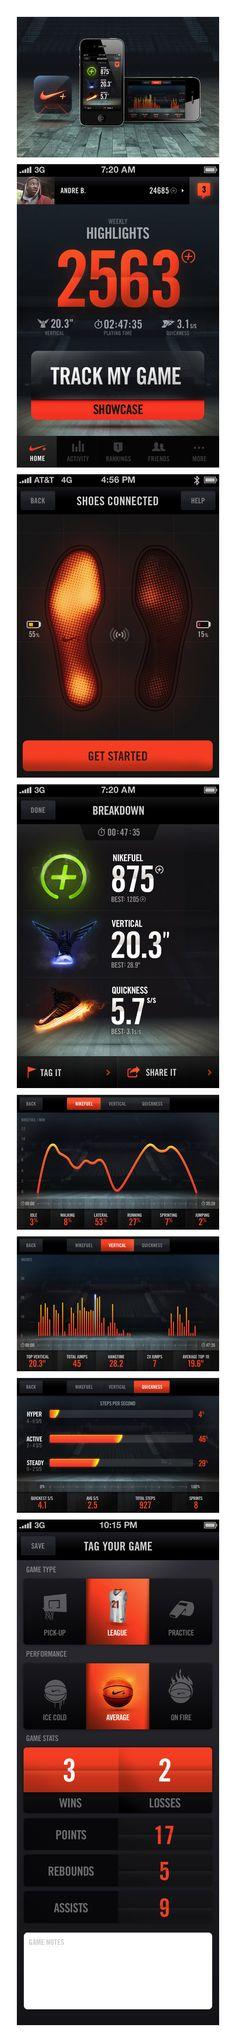 Nike+ Basketball by Jordan Fripp, via Behance.  Category: Web Design / Graphics Design / User Interface (UI)